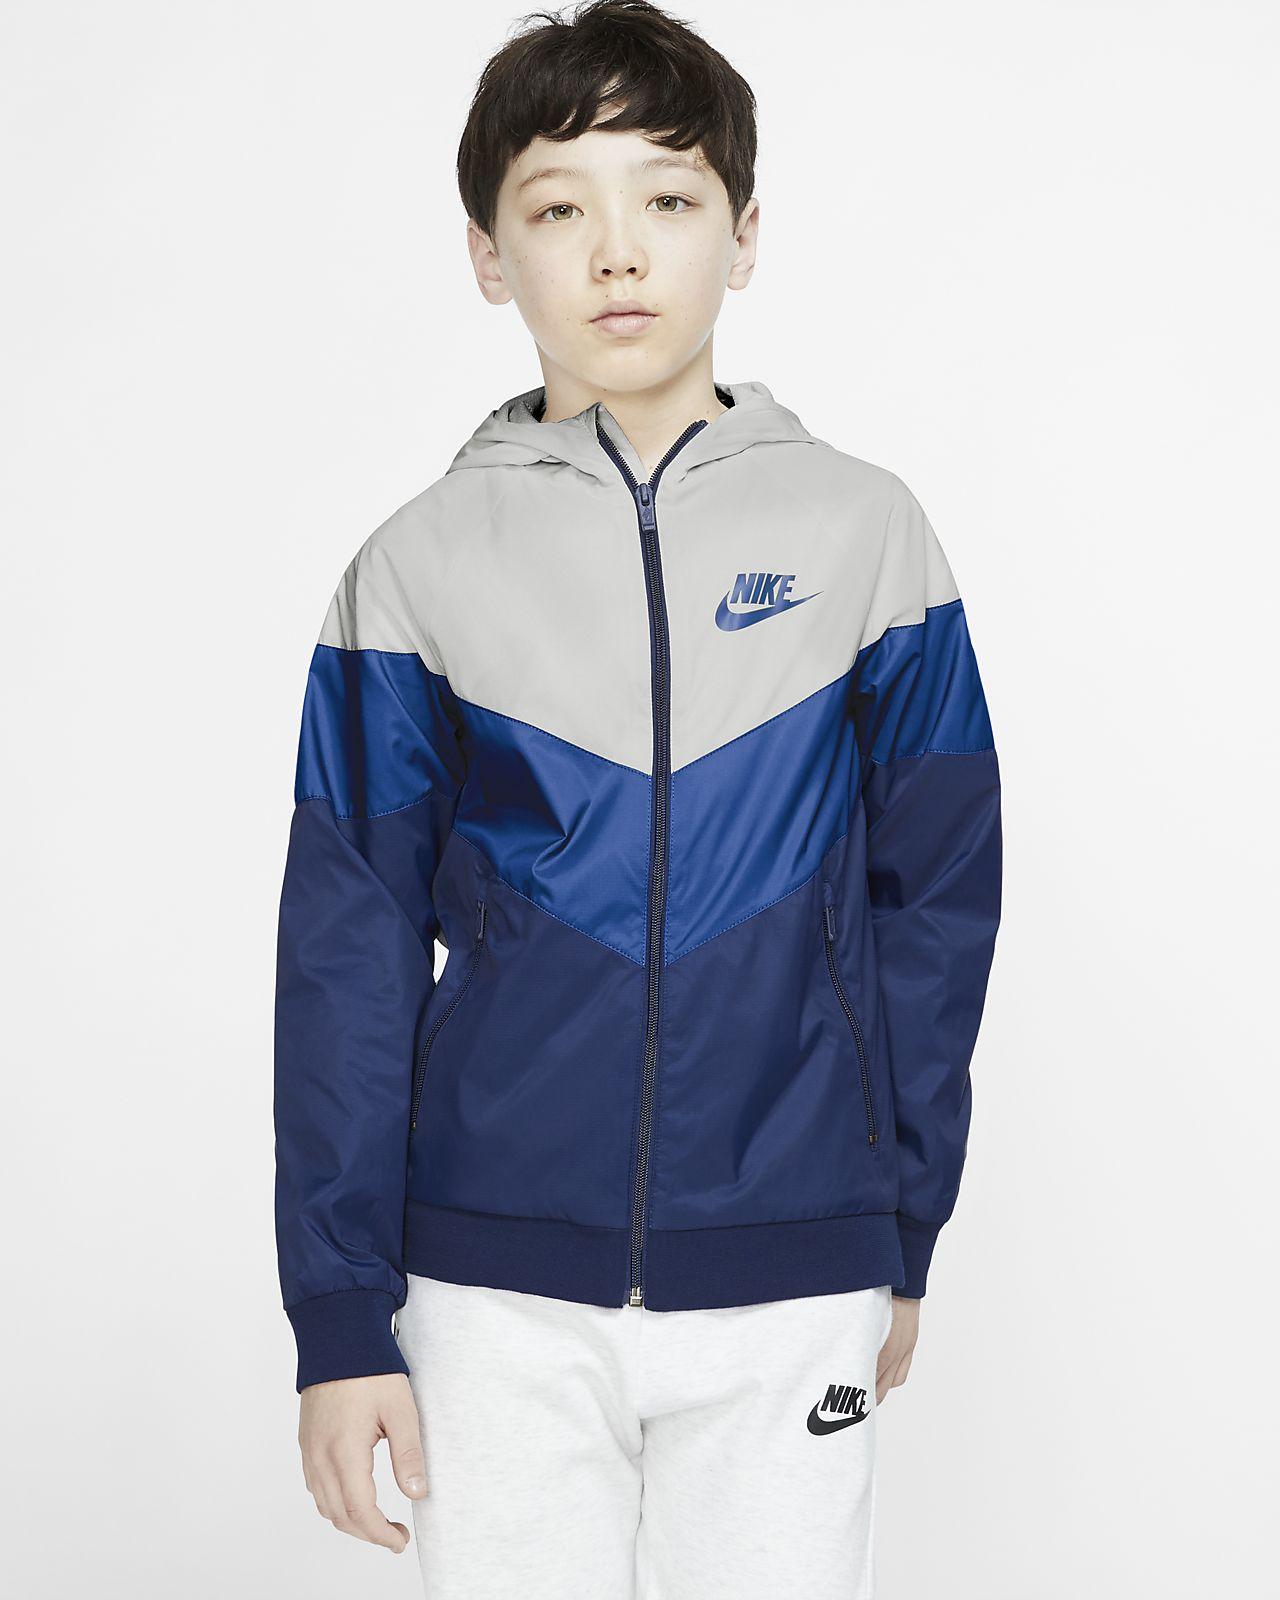 9371edeb7d28b Nike Sportswear Windrunner Big Kids' (Boys') Jacket. Nike.com